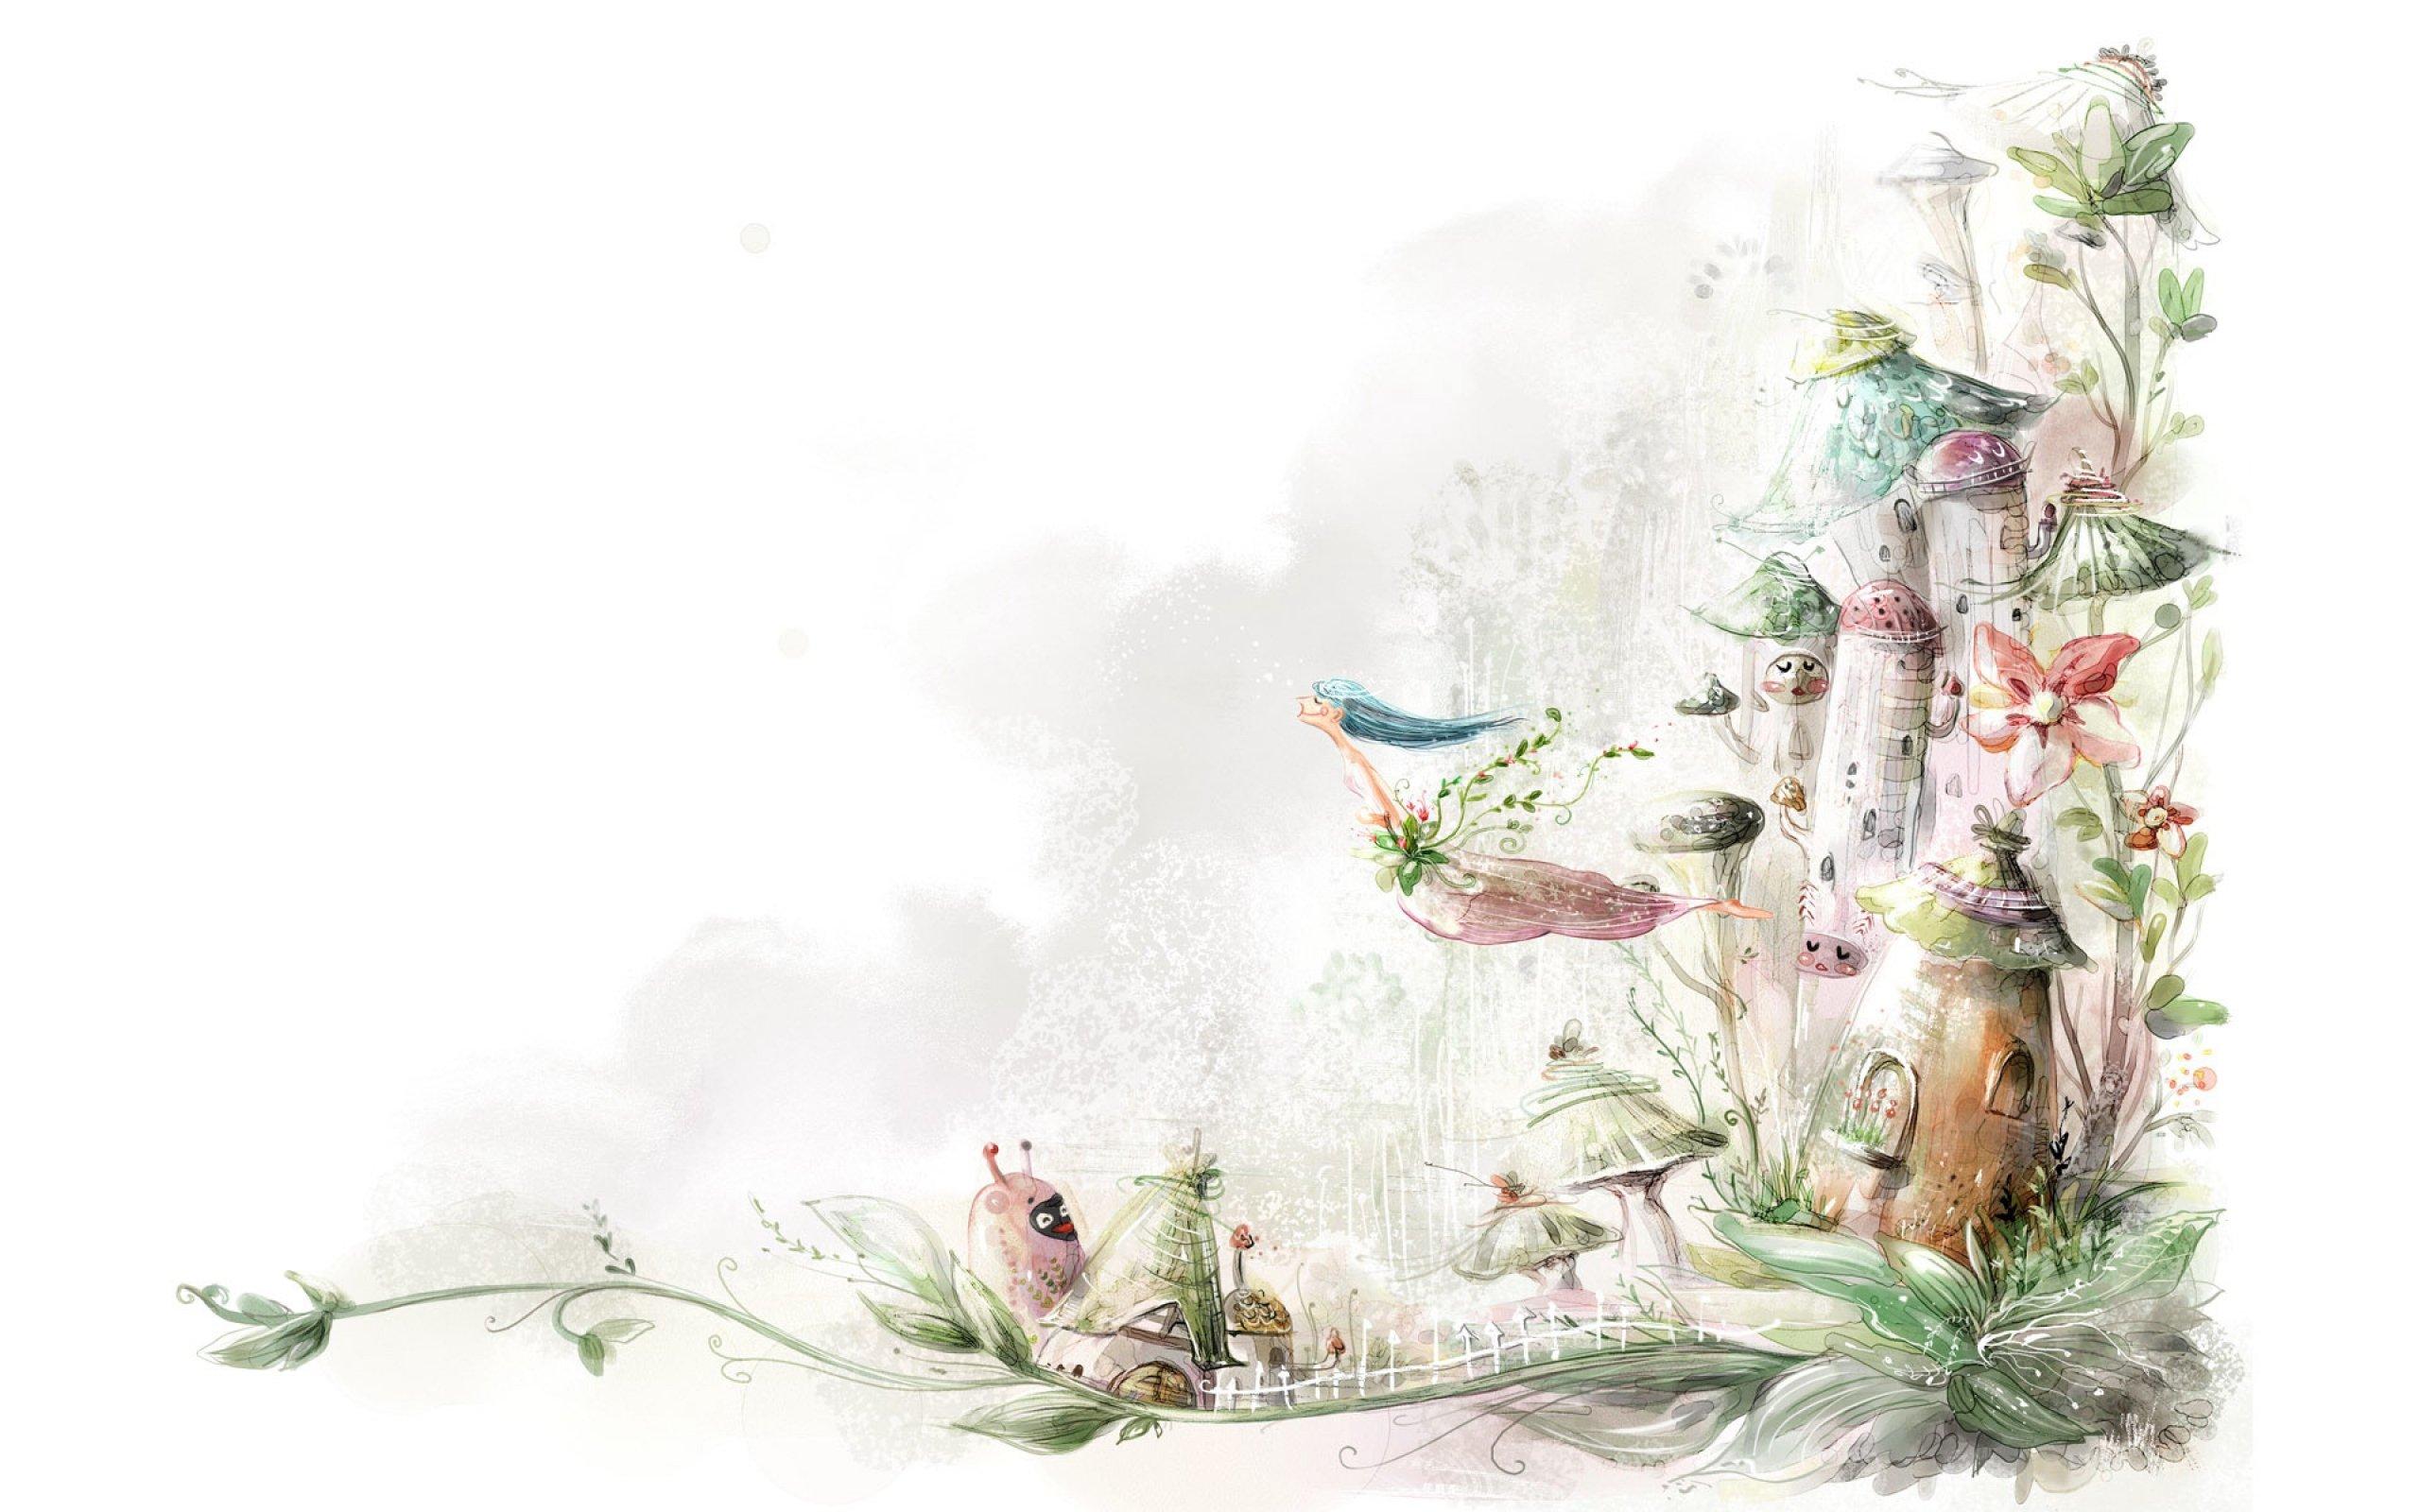 fairy tale powerpoint template free download - artistic art artwork painting original f wallpaper